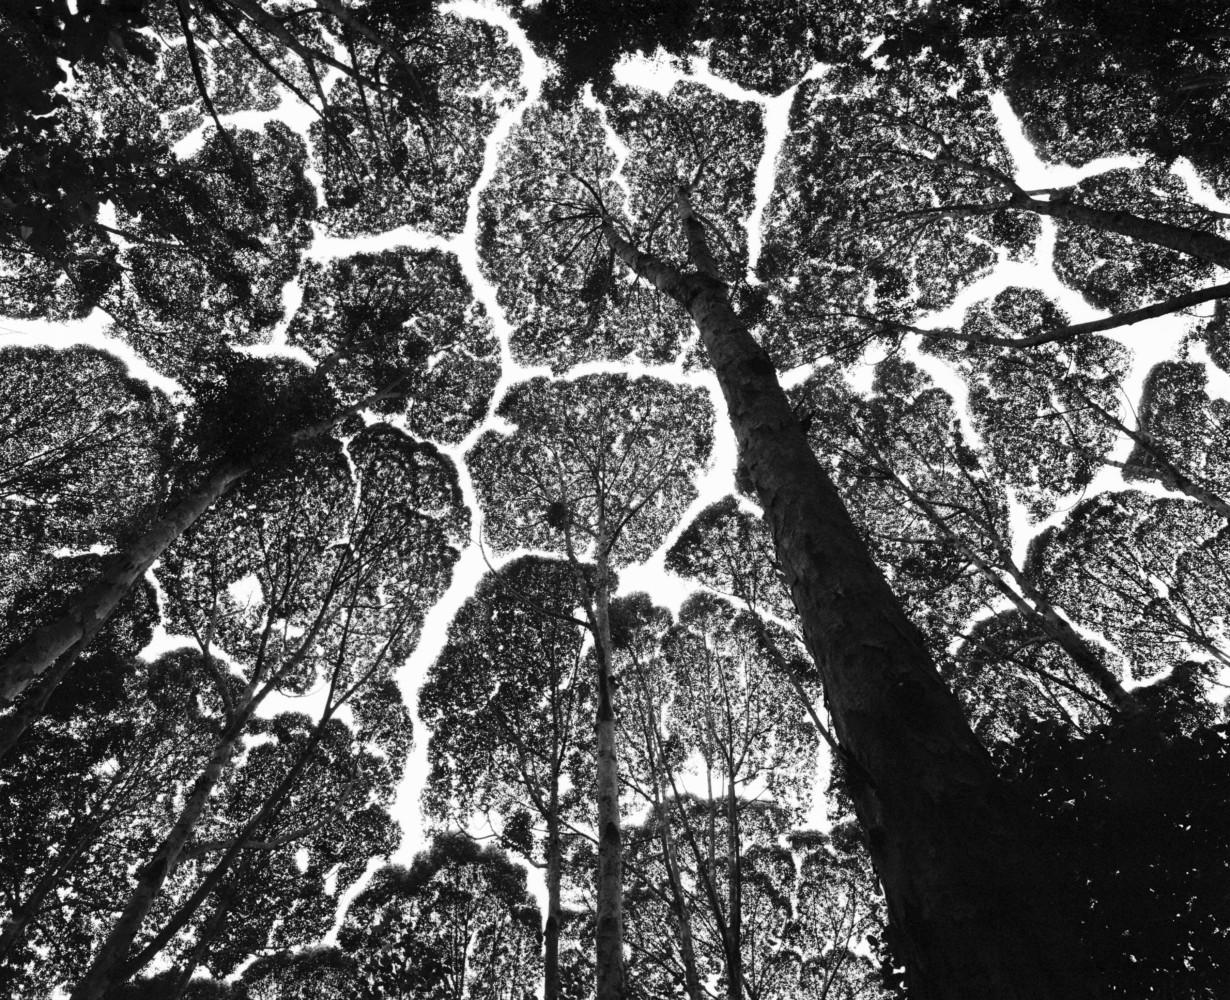 Trees of Life • Magnum Photos